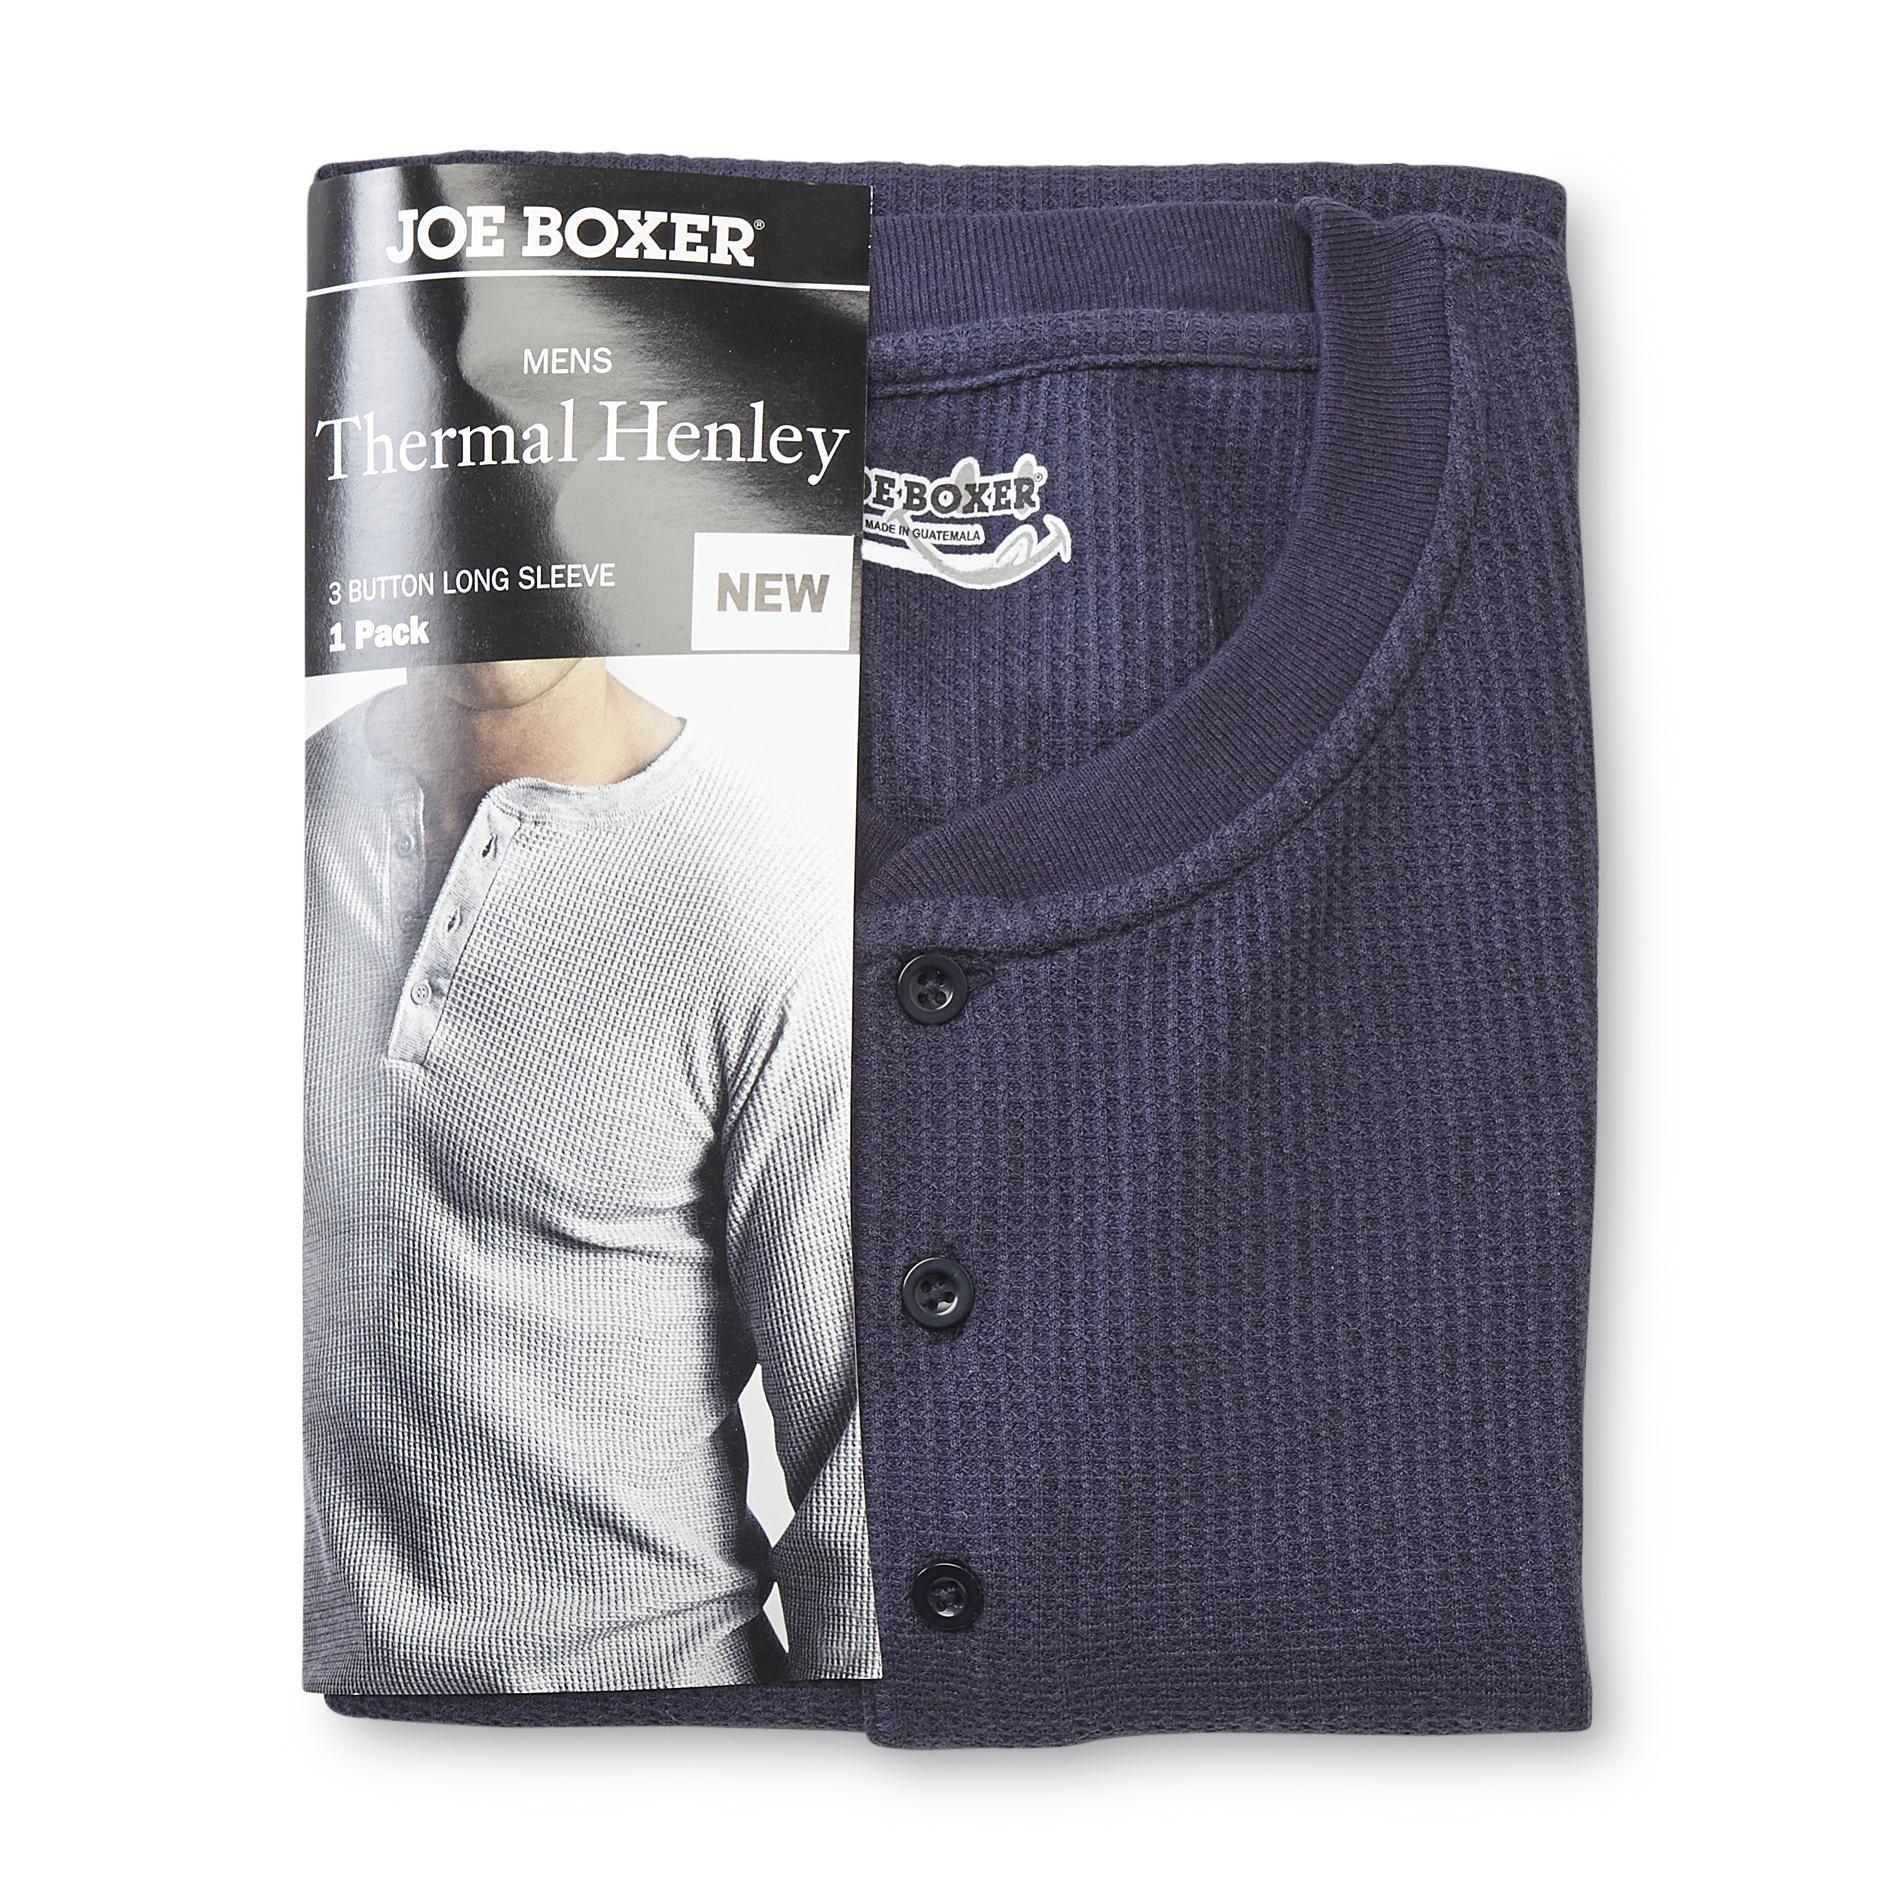 Joe Boxer Men' Thermal Henley Shirt - Clothing Shoes & Jewelry